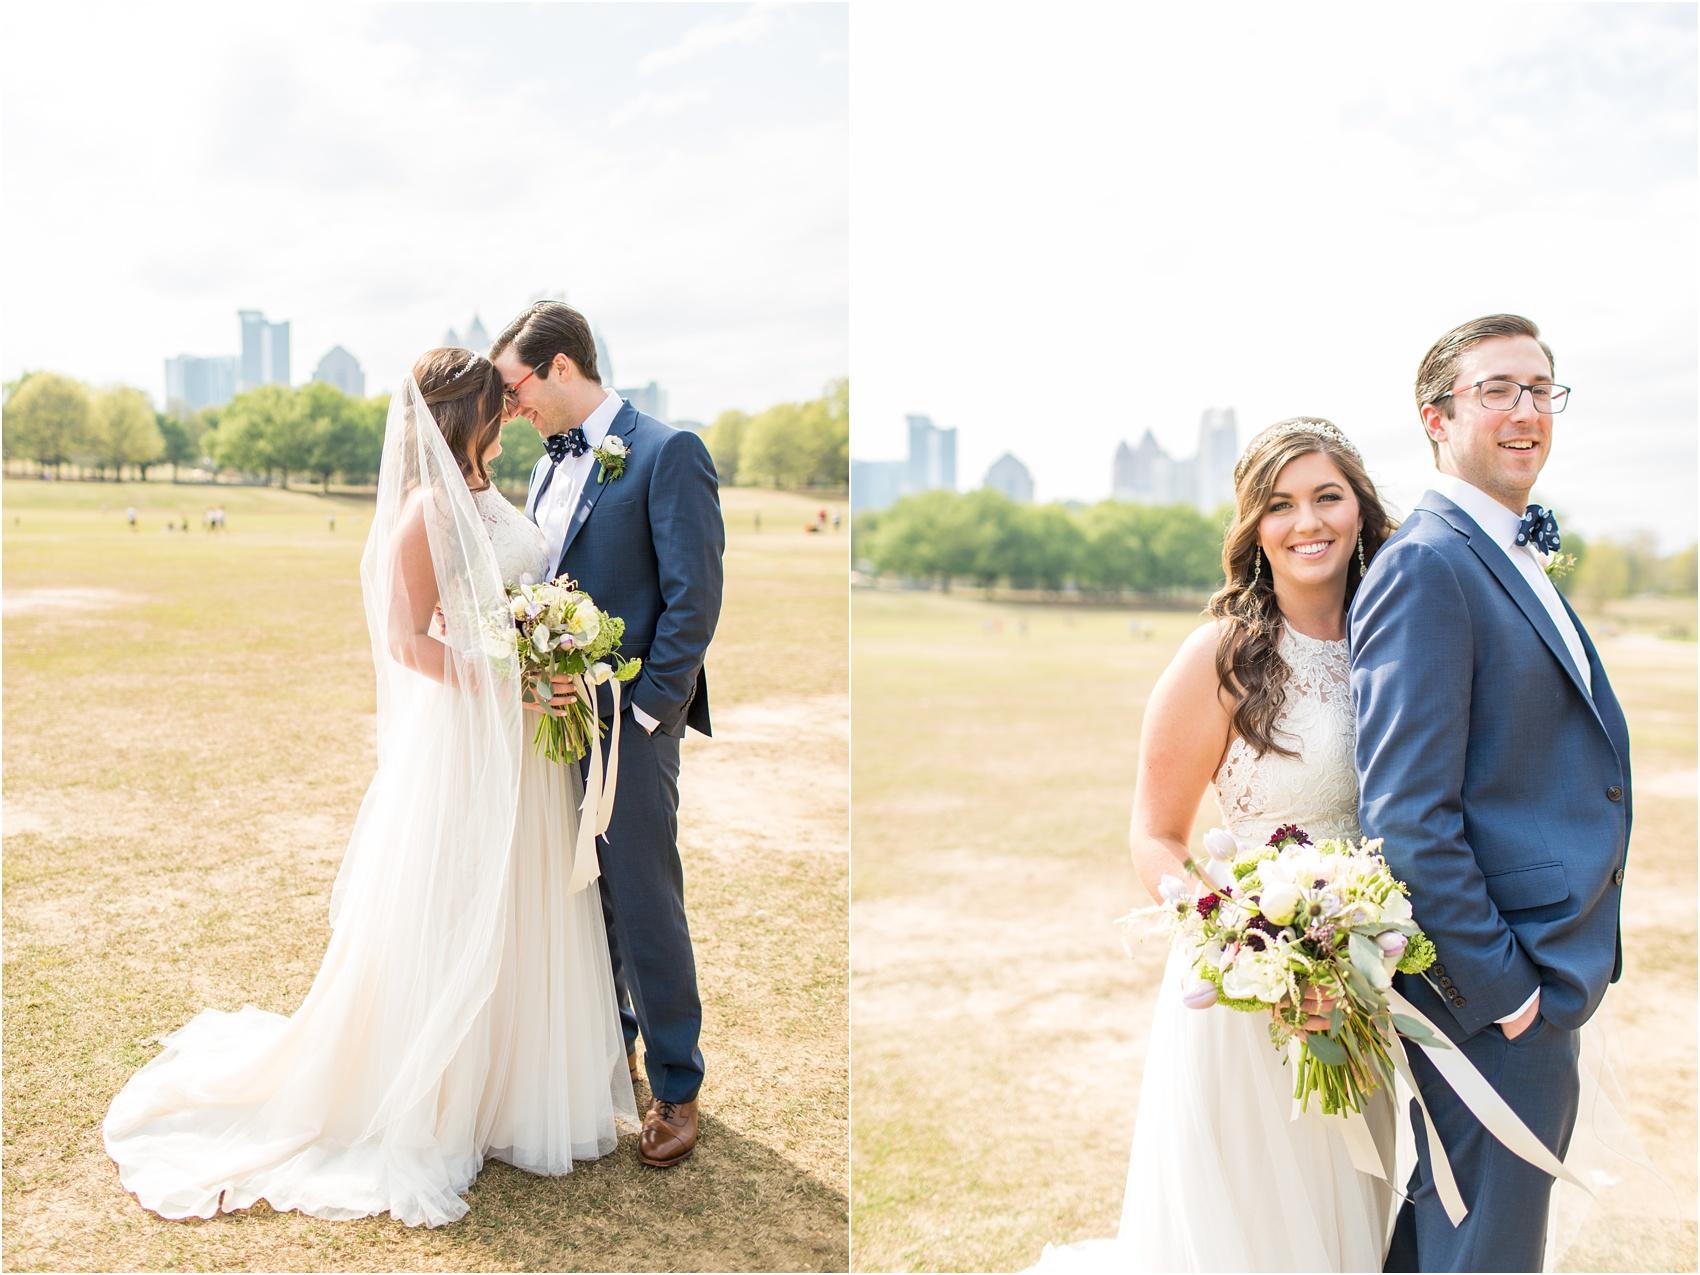 Savannah Eve Photography- Groseclose Wedding- Blog-21.jpg